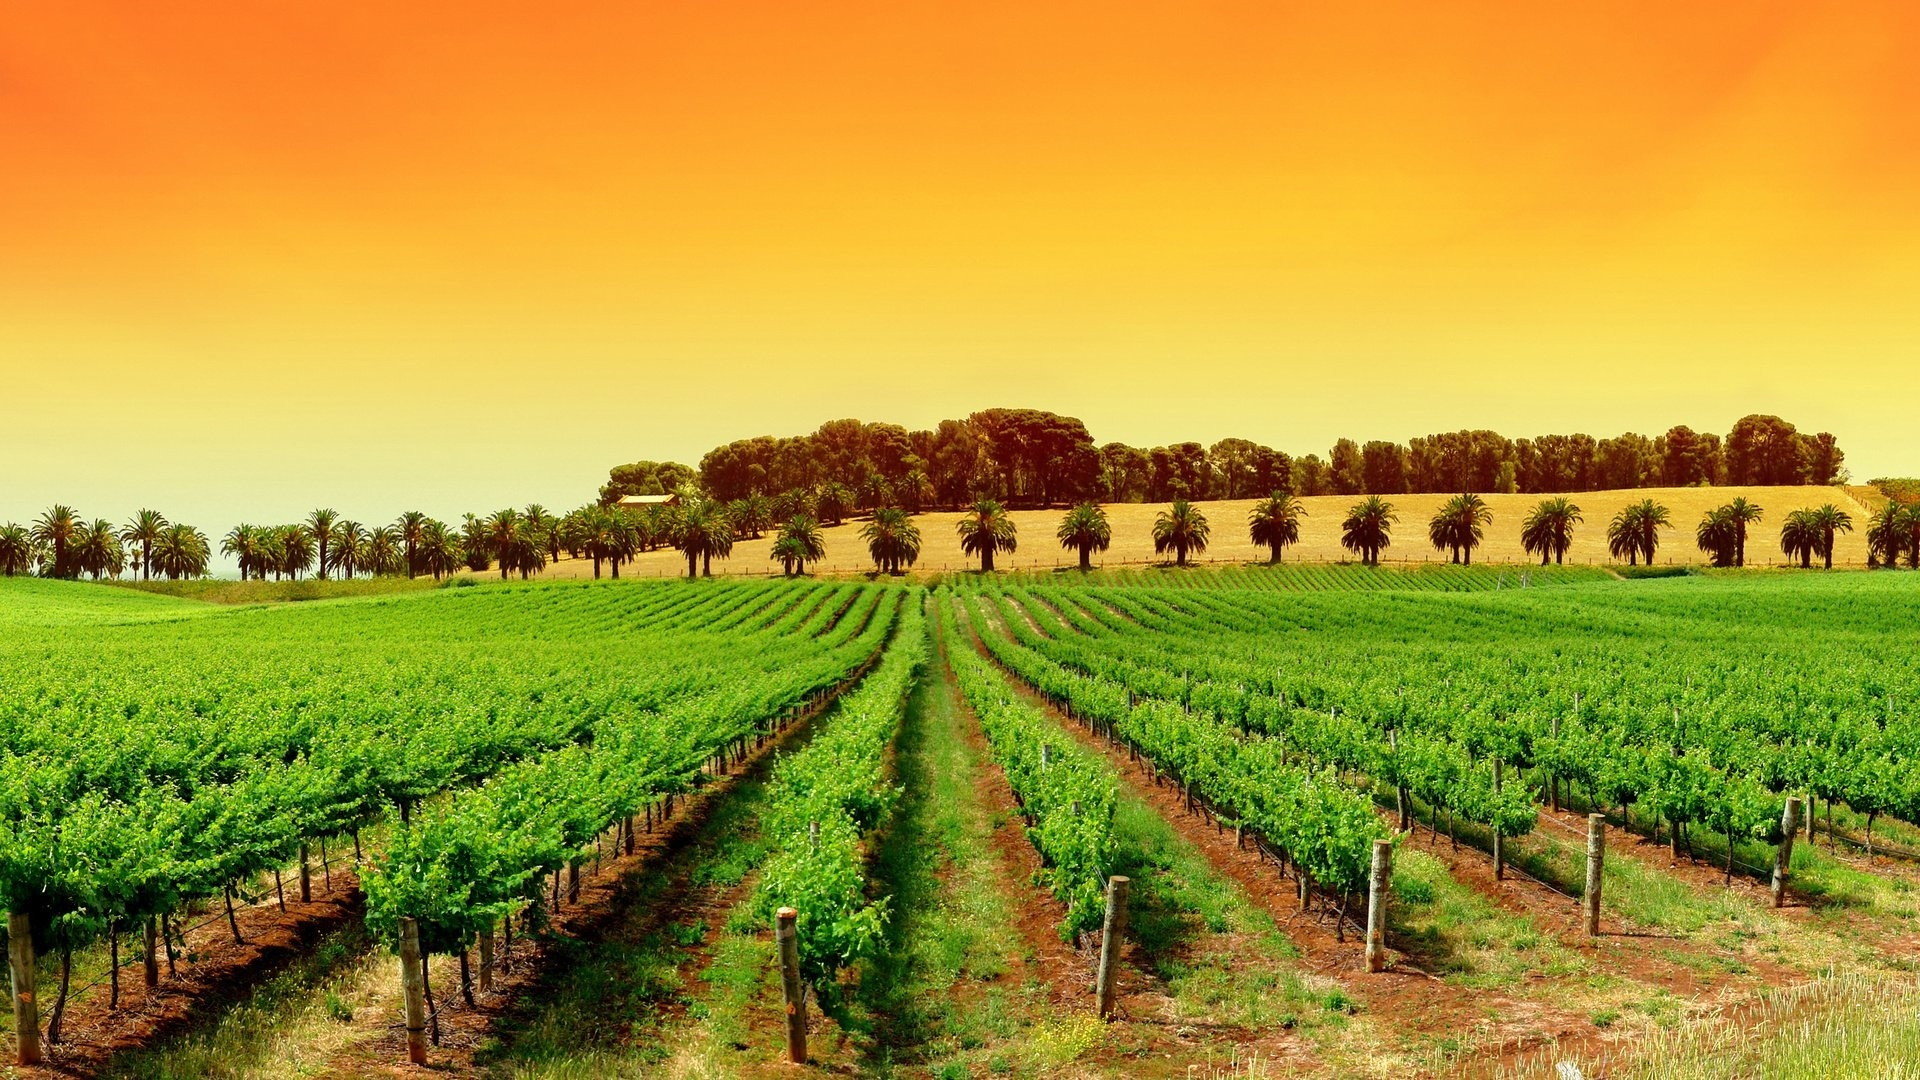 Vineyard background wallpaper